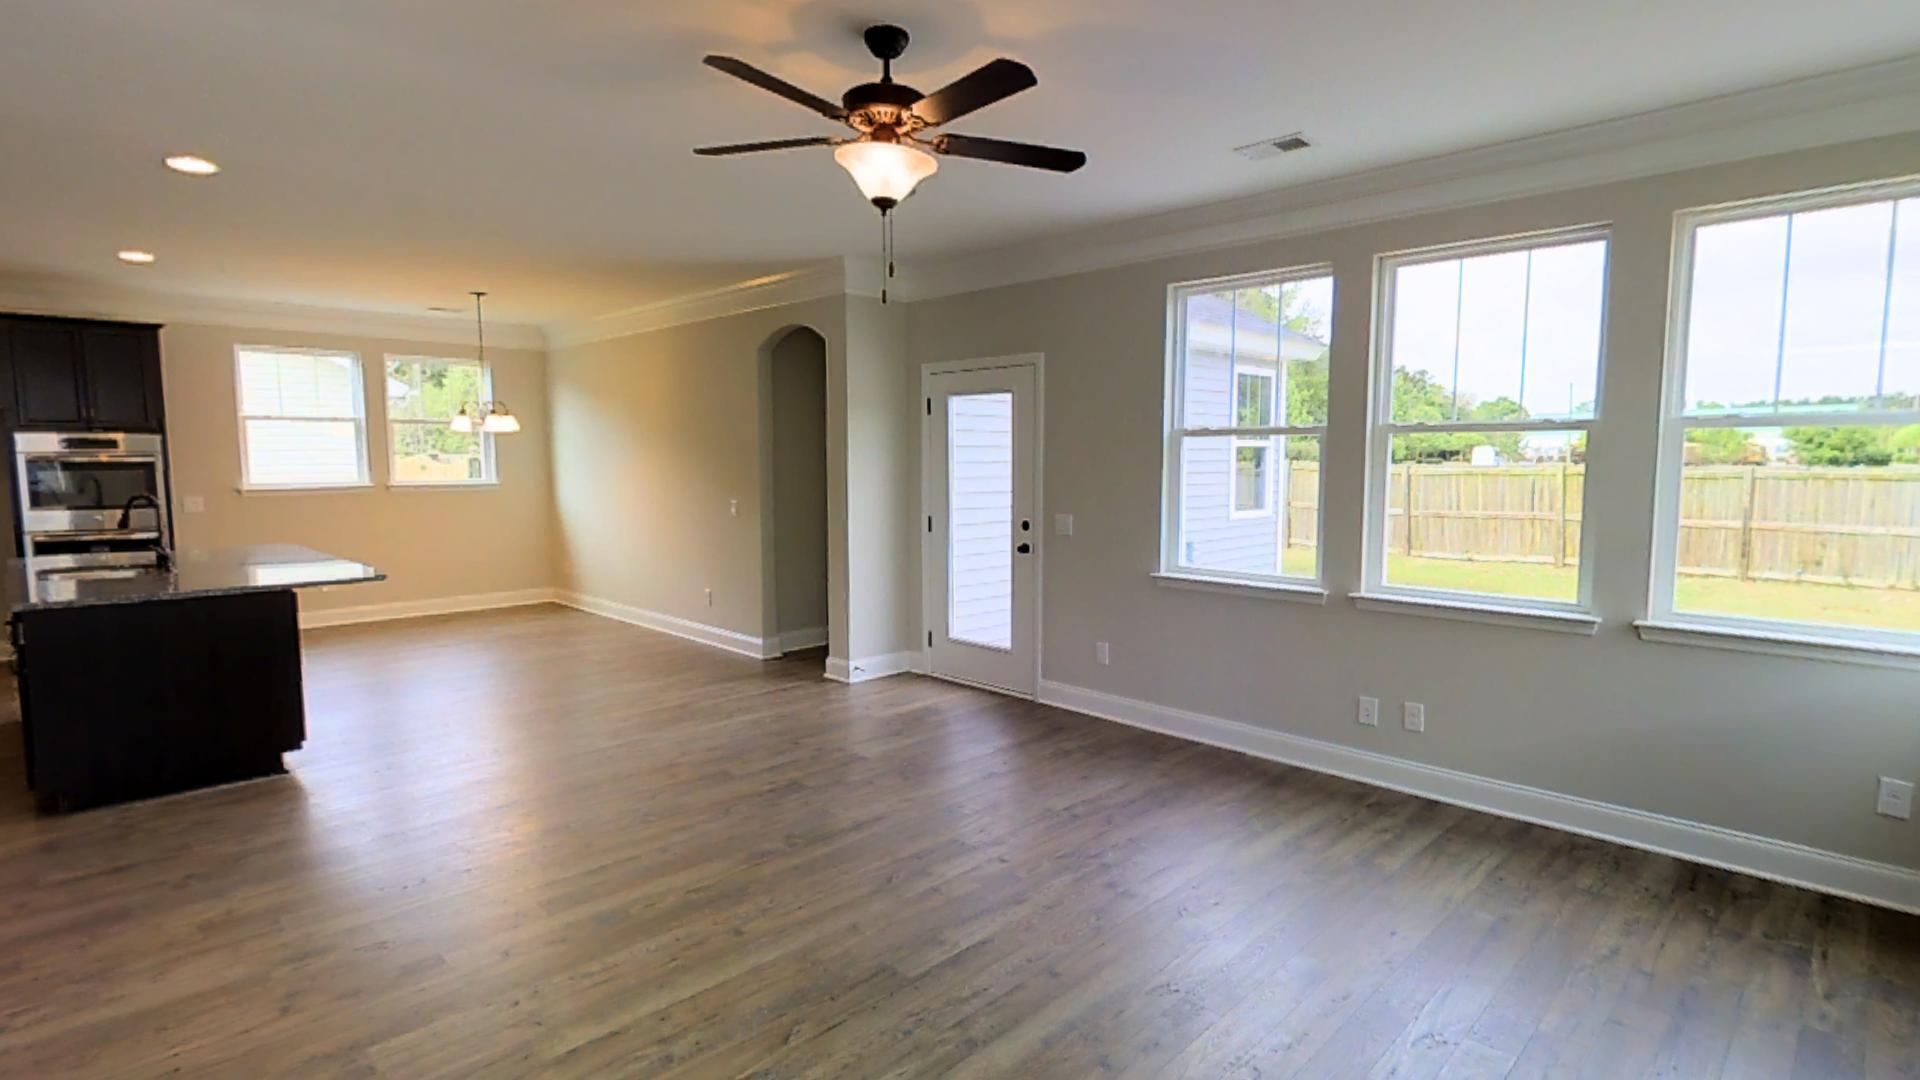 Pinehill Acres Homes For Sale - 129 Schoonover, Summerville, SC - 3